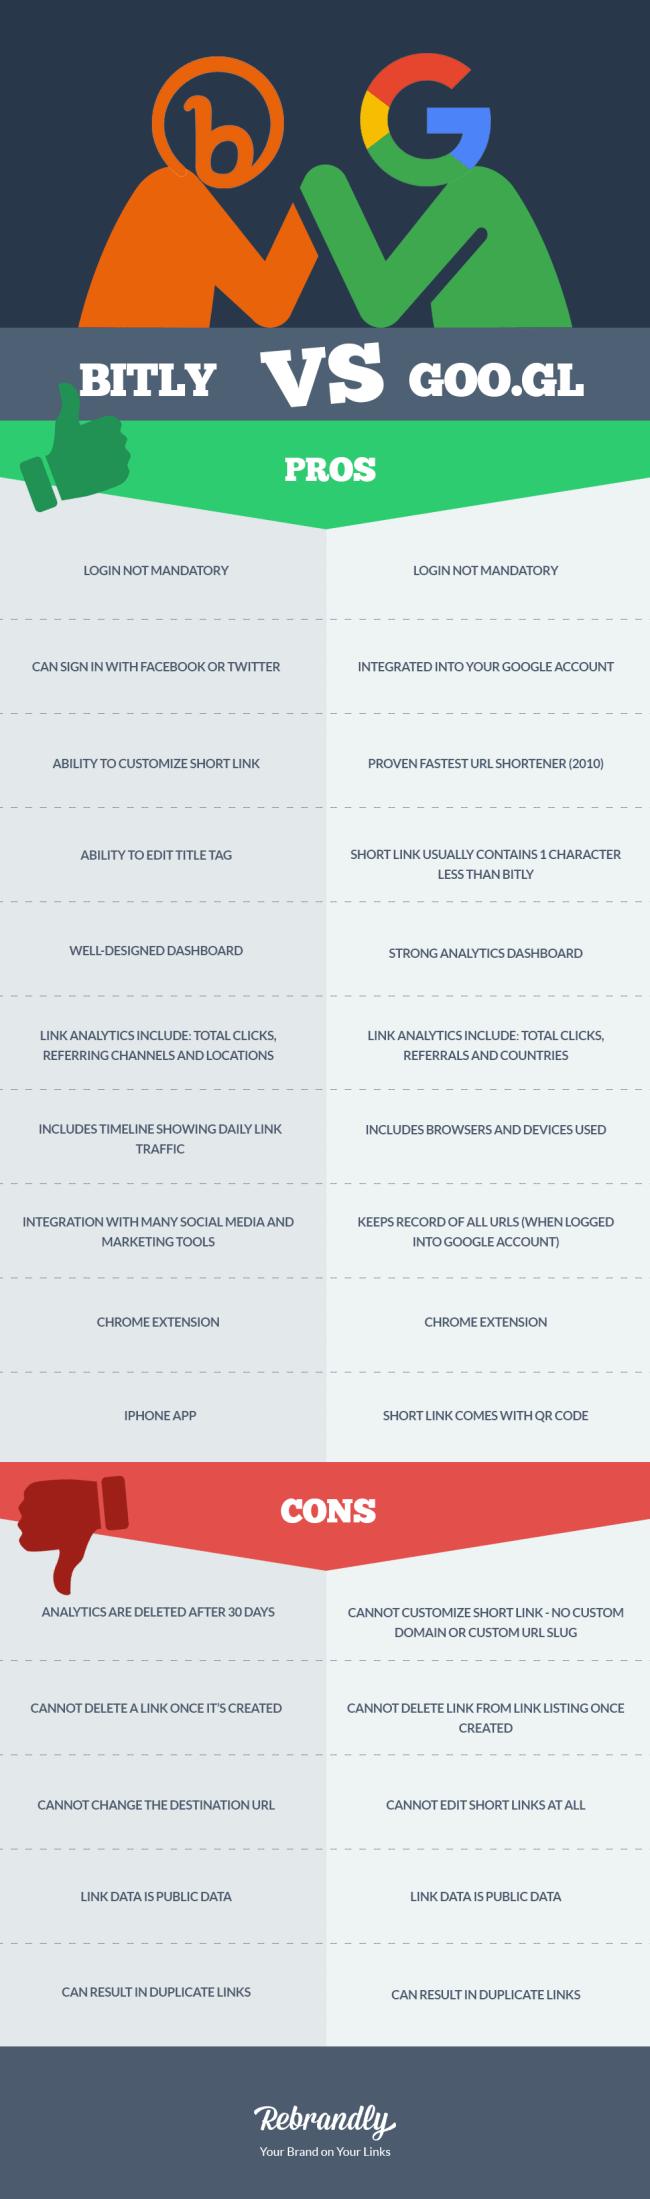 Bitly vs Google Infographic - Rebrandly Blog